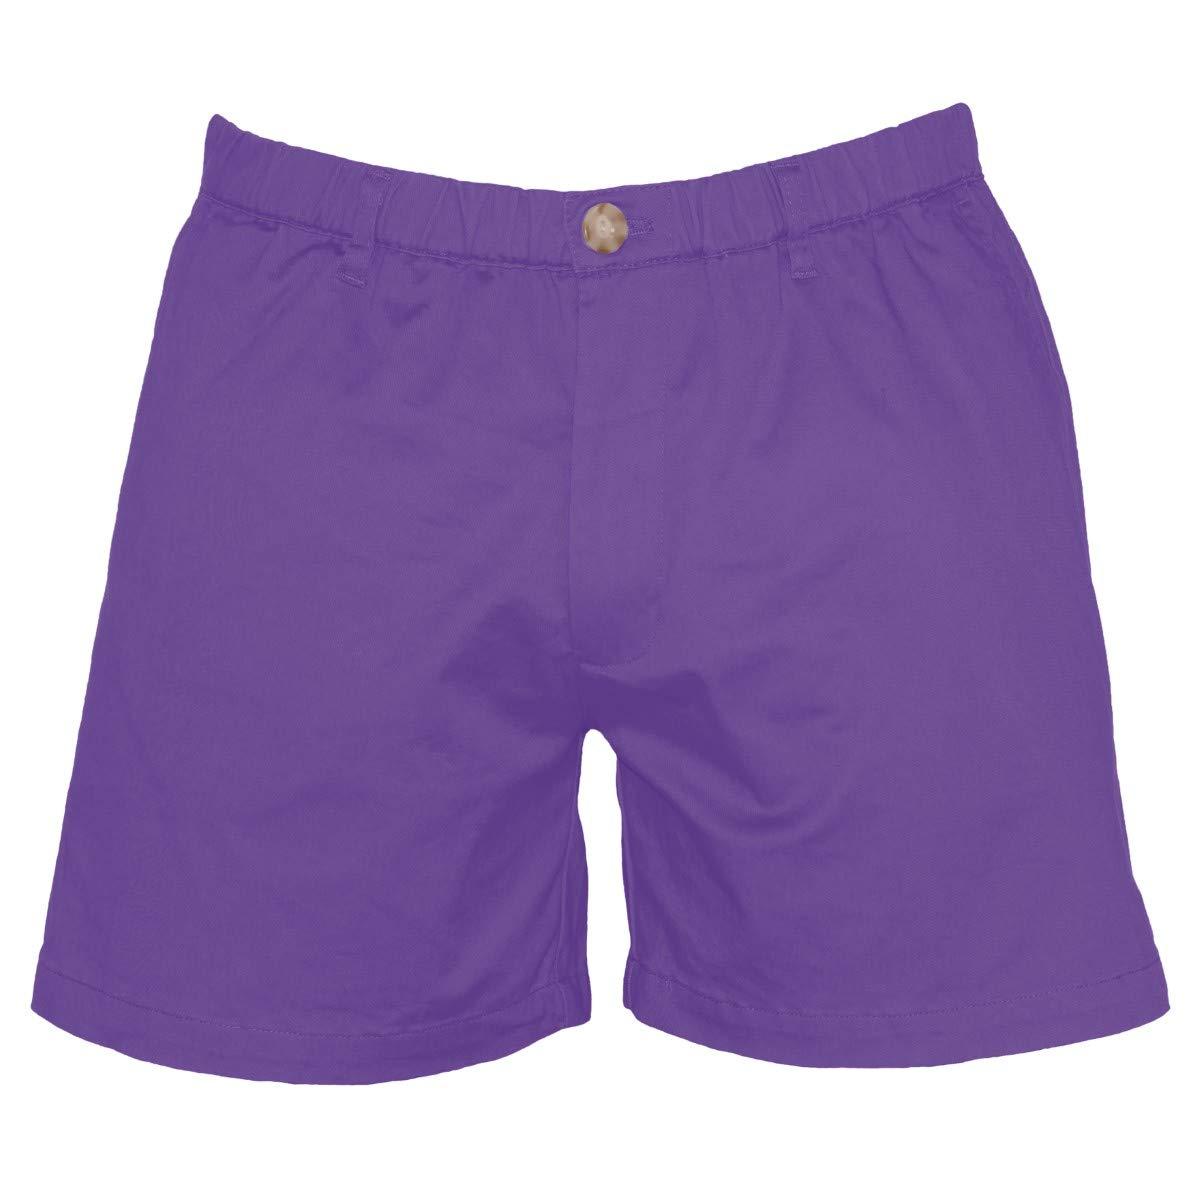 Meripex Apparel Mens 5.5 Inseam Elastic-Waist Short Shorts 4-Way Stretch